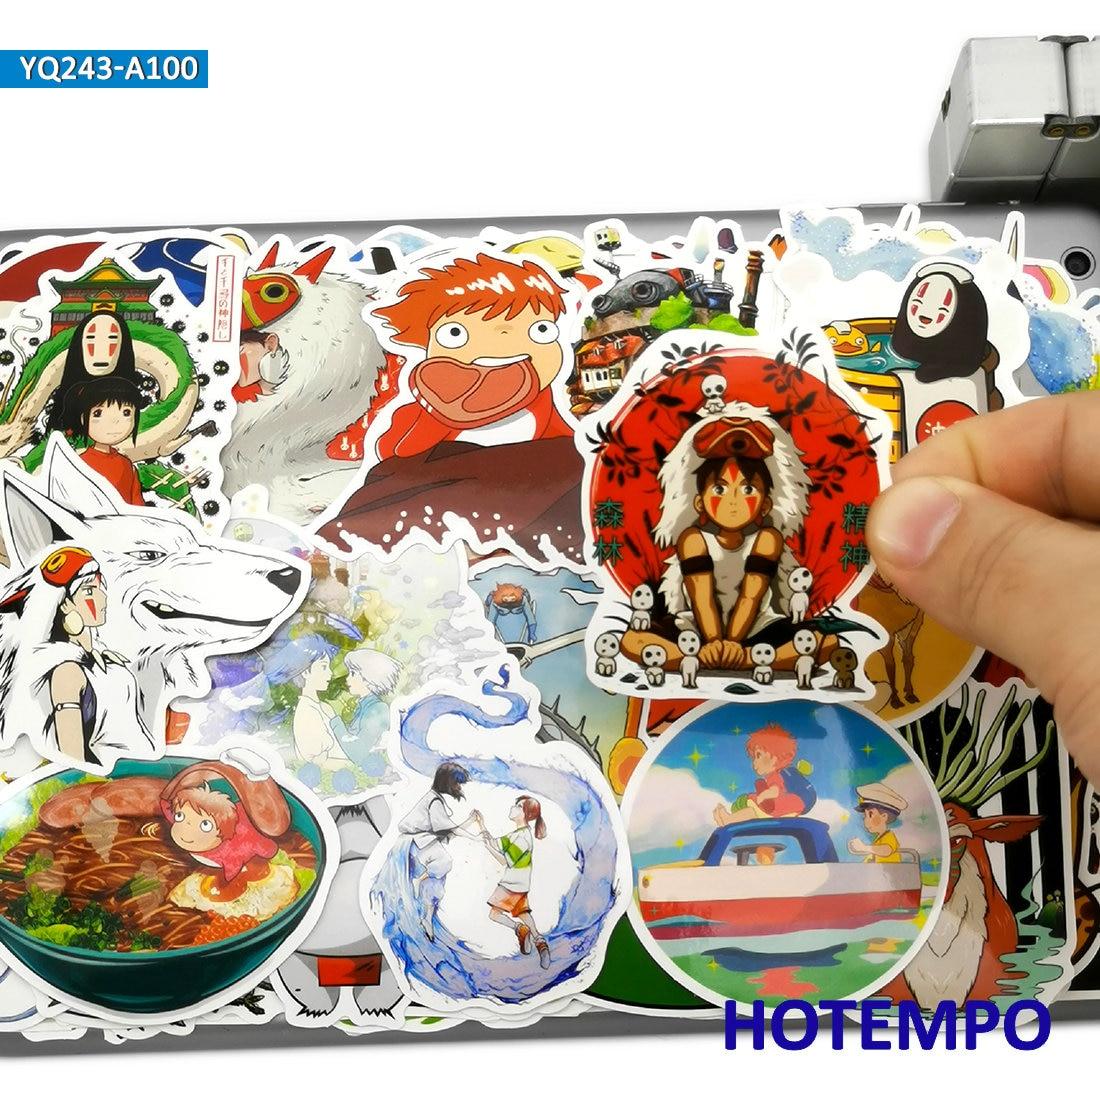 AliExpress - 100pcs Manga Miyazaki Hayao Classic Anime Movie Stickers Toys for Kids Mobile Phone Laptop Luggage Skateboard Art Decal Stickers